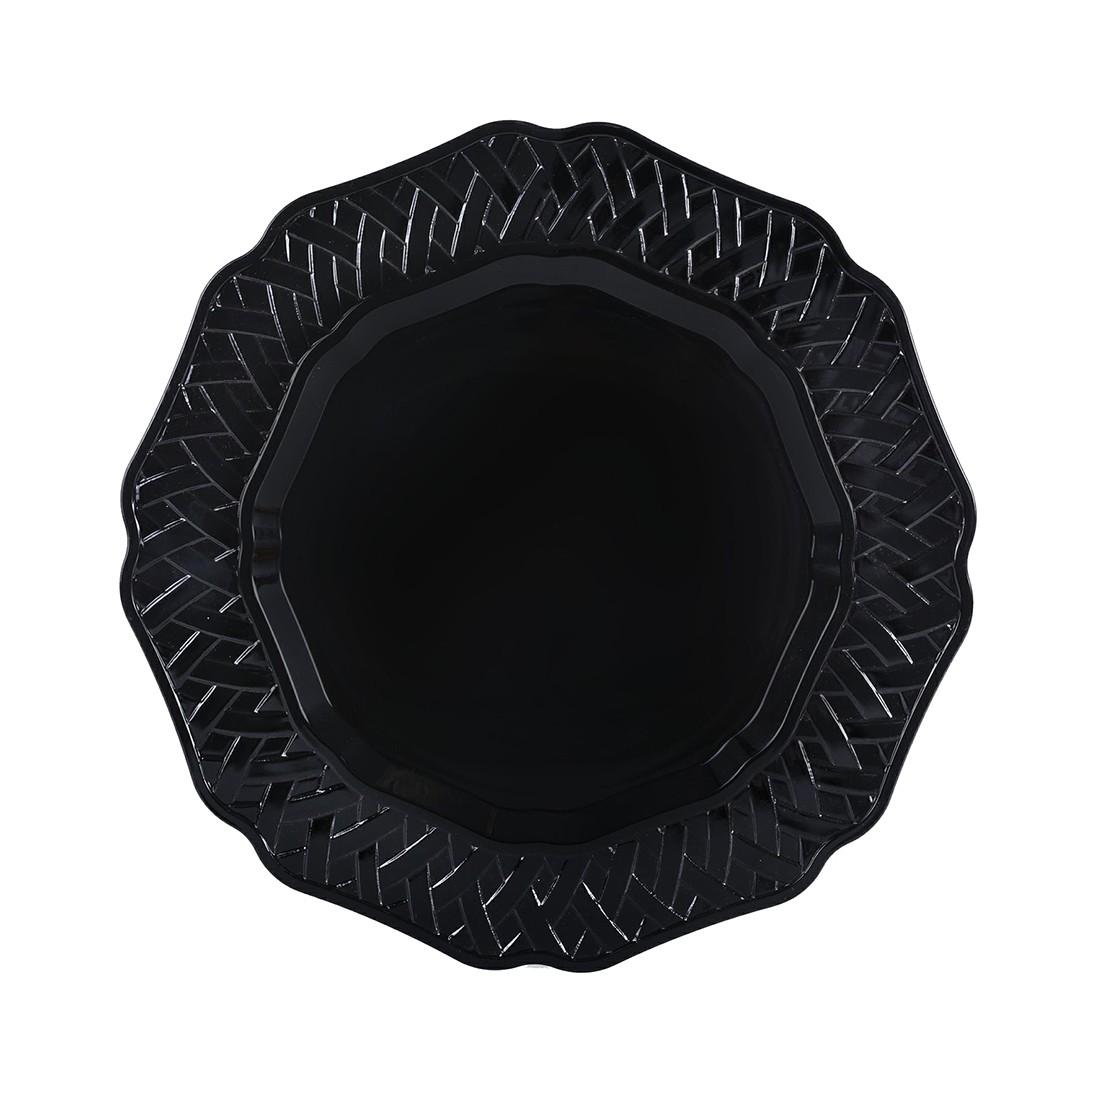 Sousplat Redondo Plastico 33cm Preto 41377-100 - G Presentes